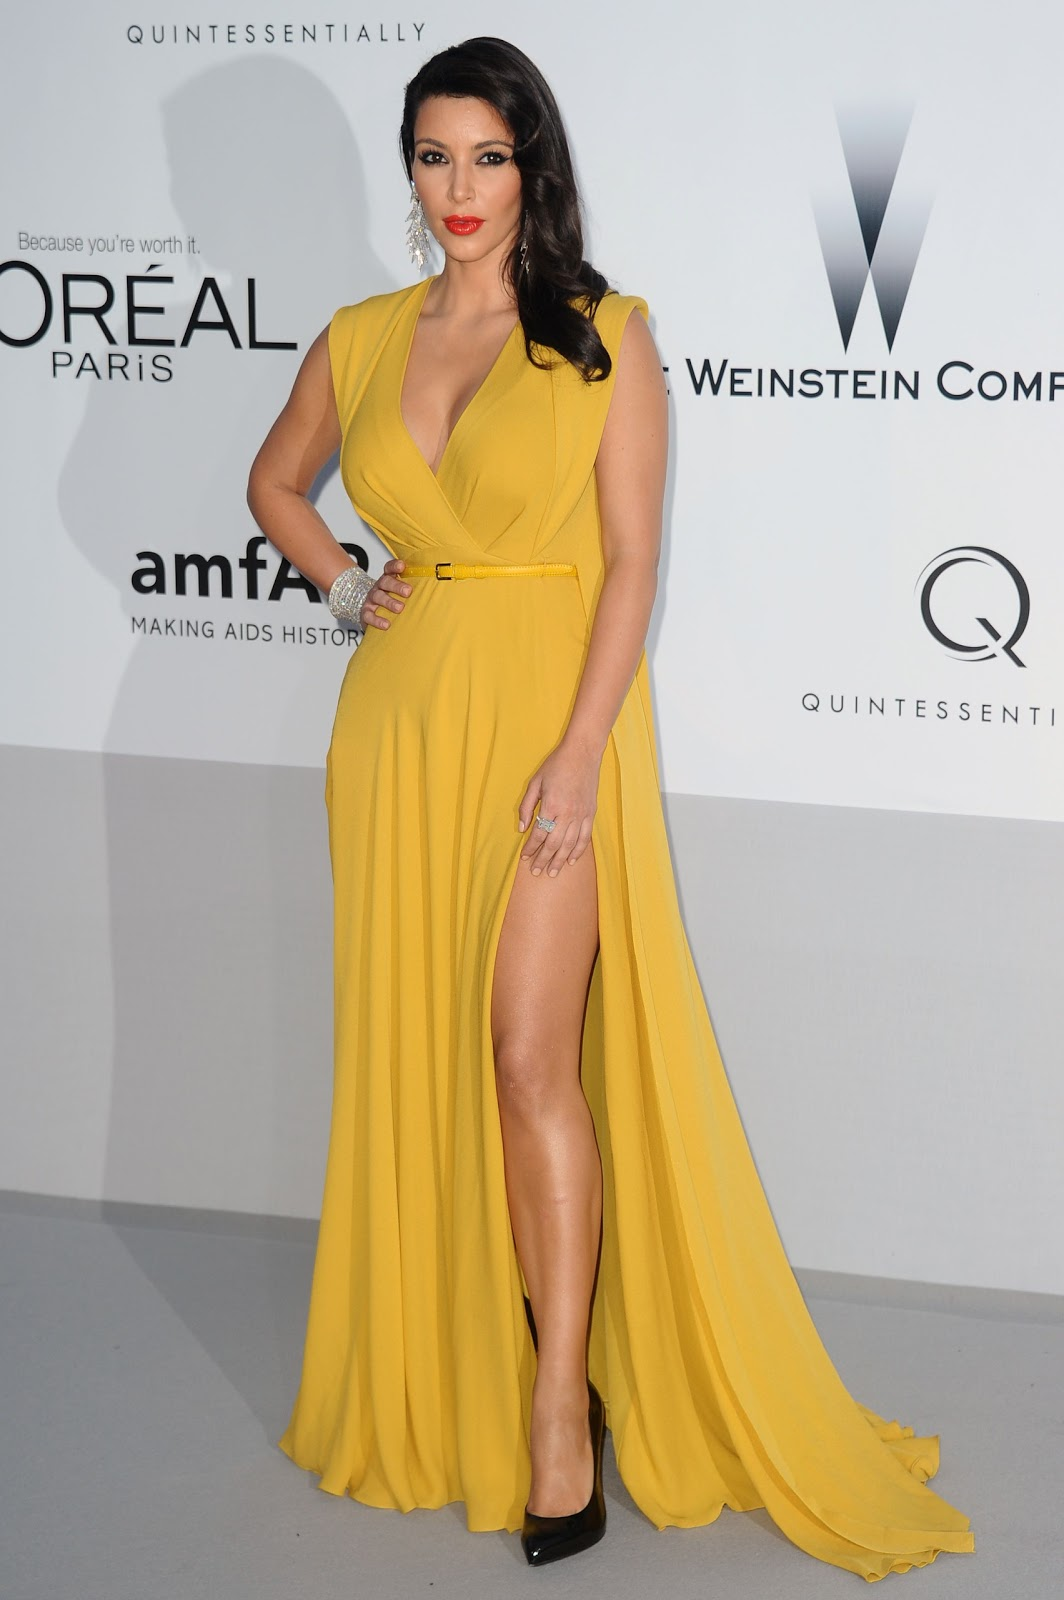 http://2.bp.blogspot.com/-ng020gNI_98/T79fDMP9FZI/AAAAAAAAGSQ/37WiSDiXpMM/s1600/Kim+Kardashian+2012+amfAR+Gala+Cannes++-02.jpg